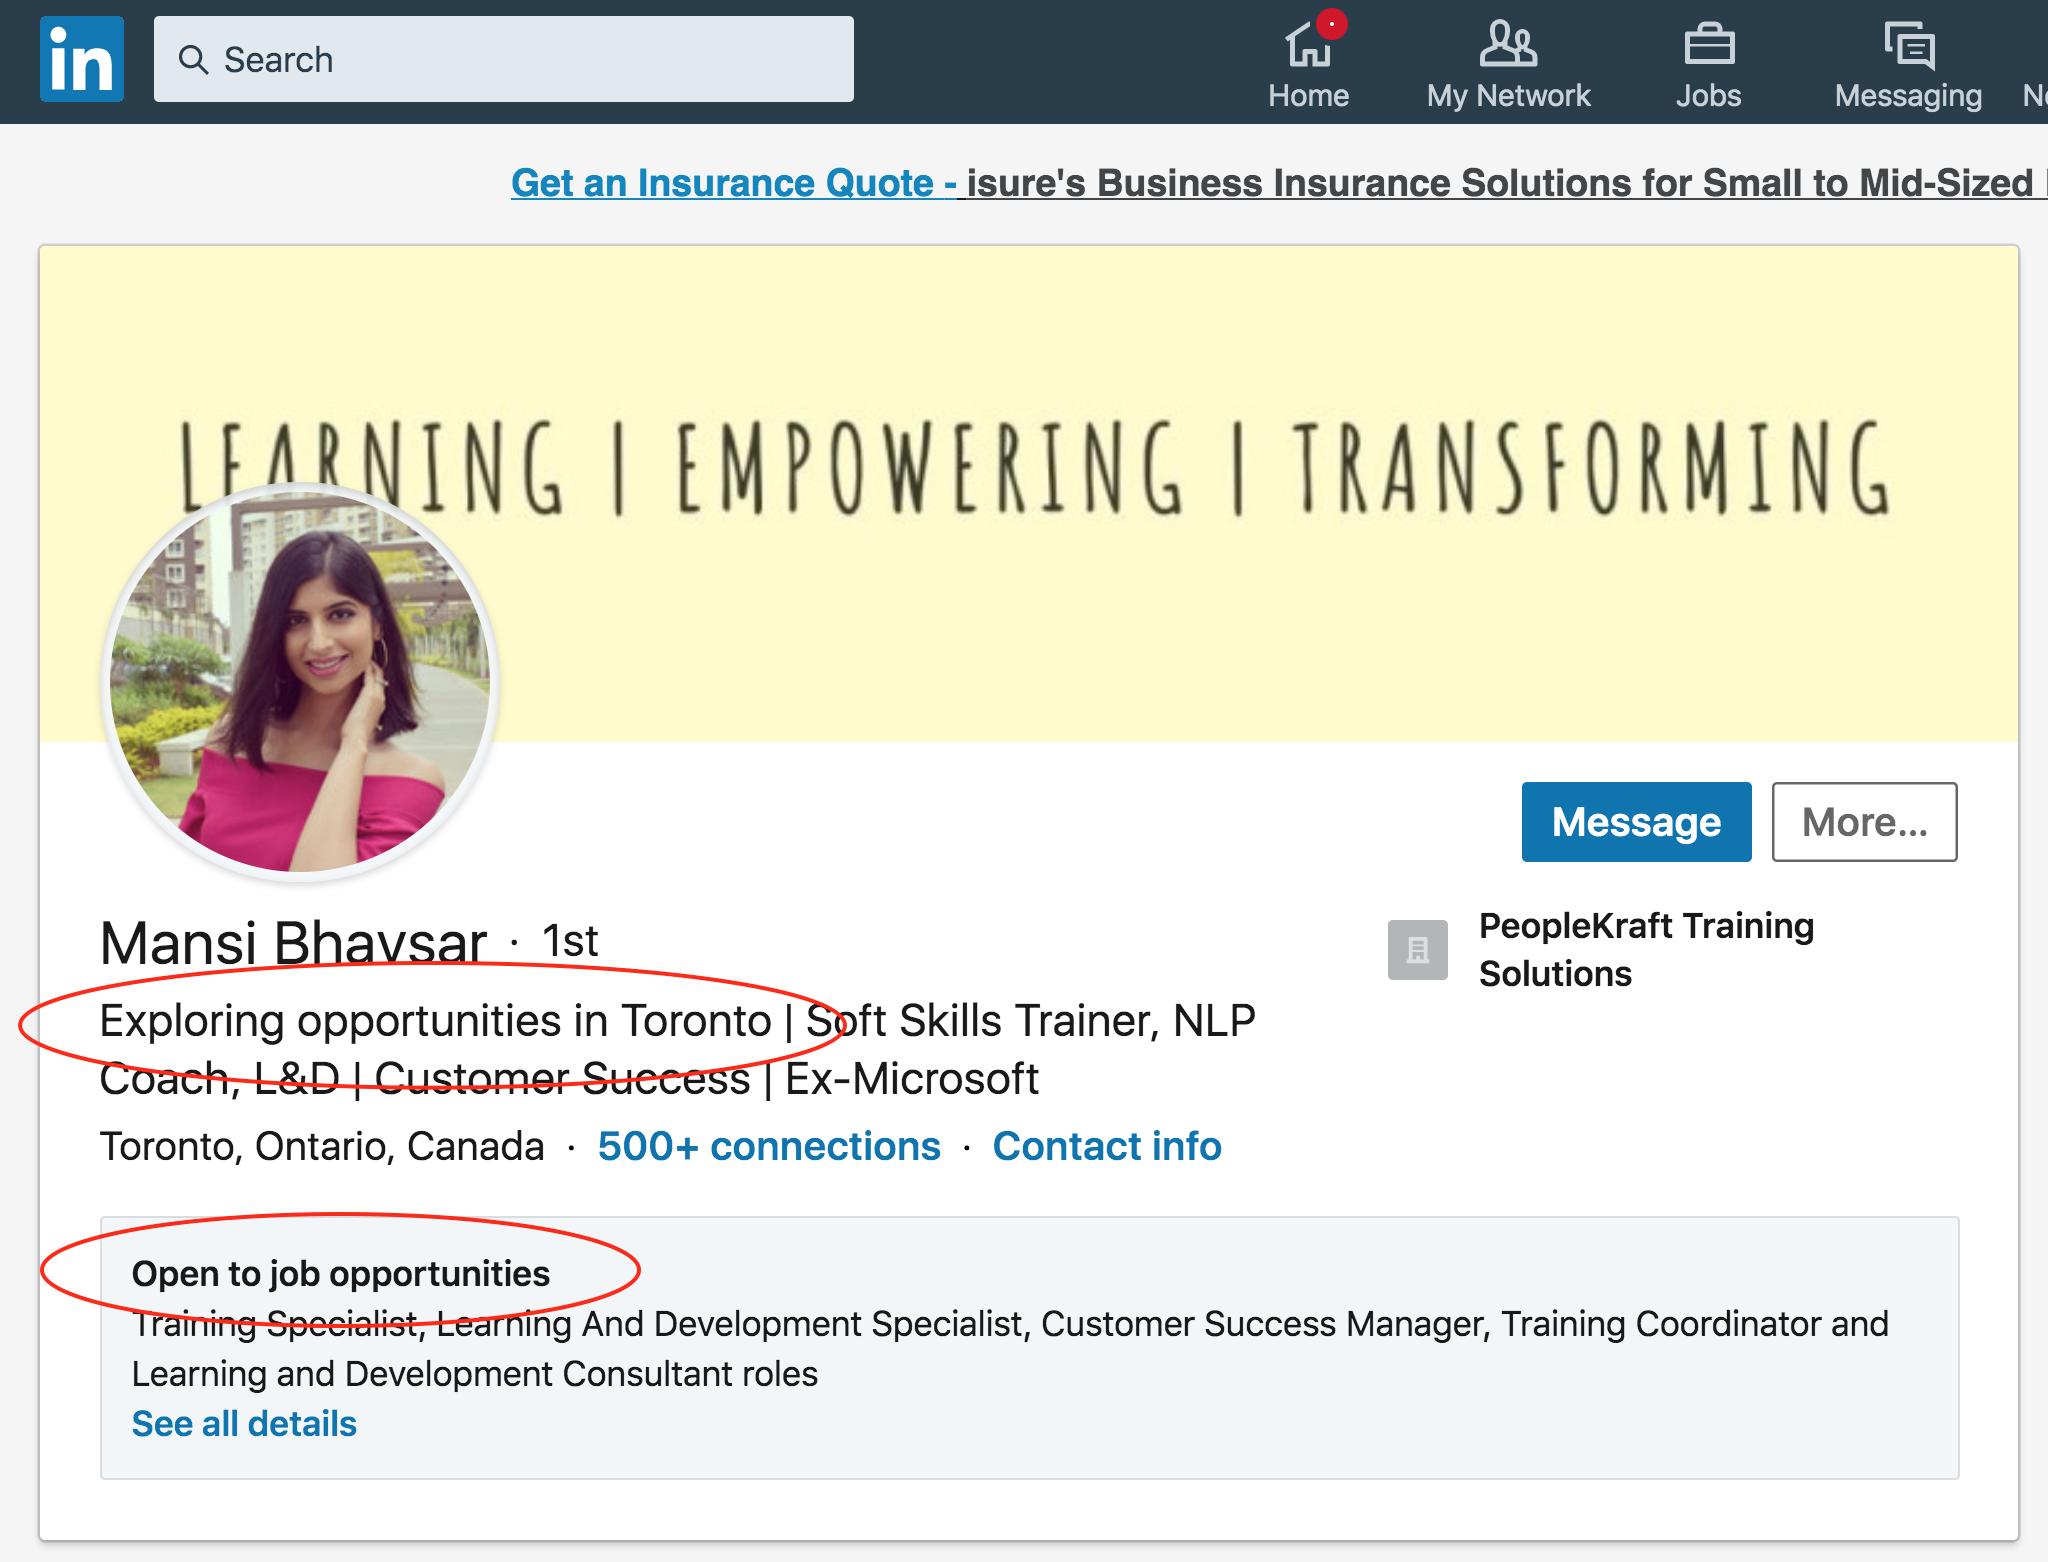 Optimizing your LinkedIn headline for job opportunities